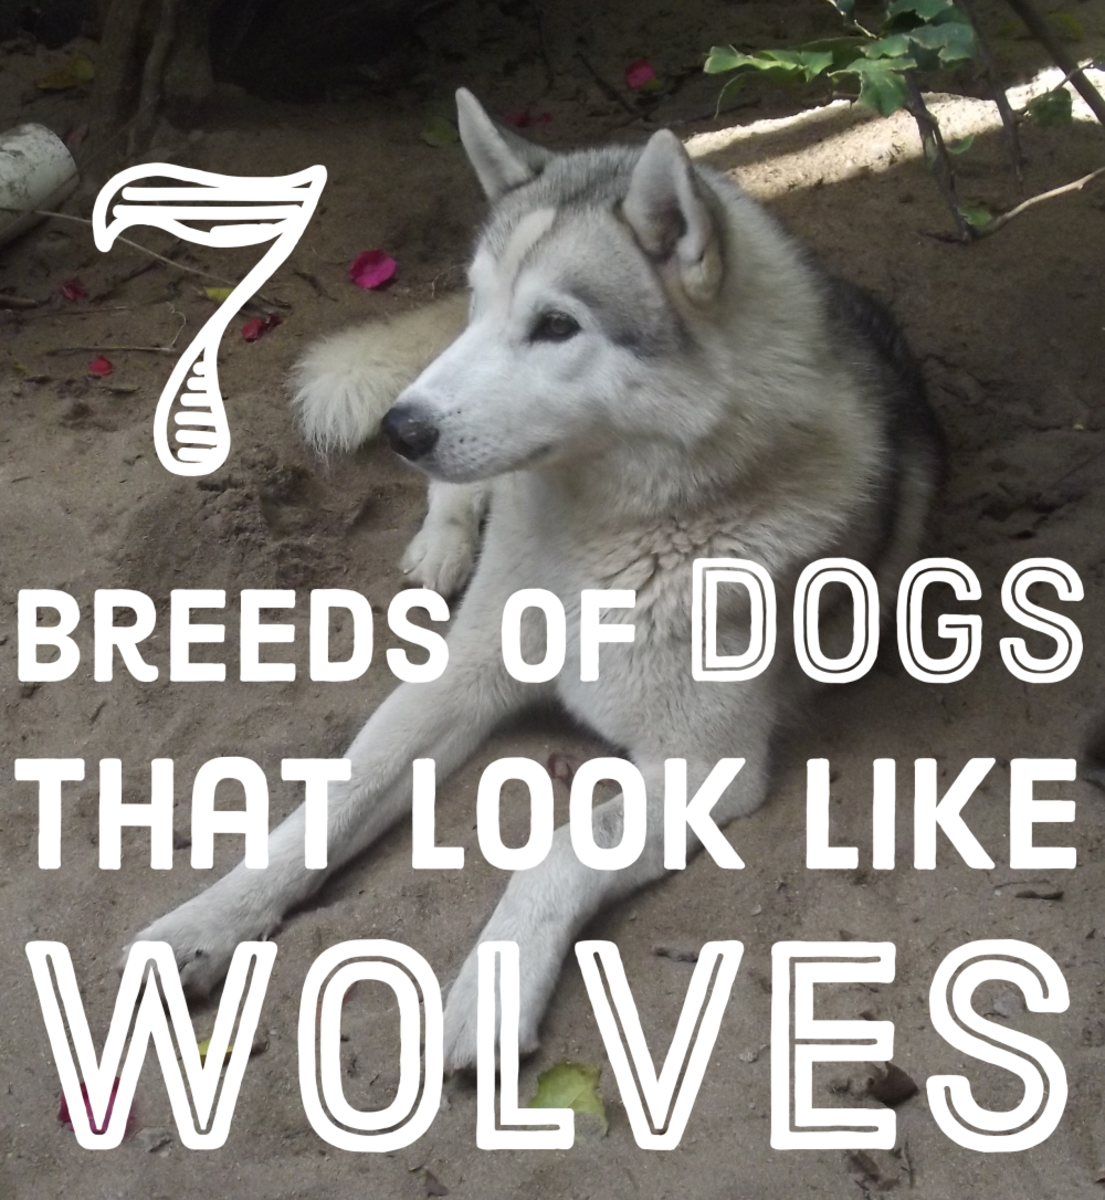 Alaskan Malamute /Siberian Husky cross: like a wolf